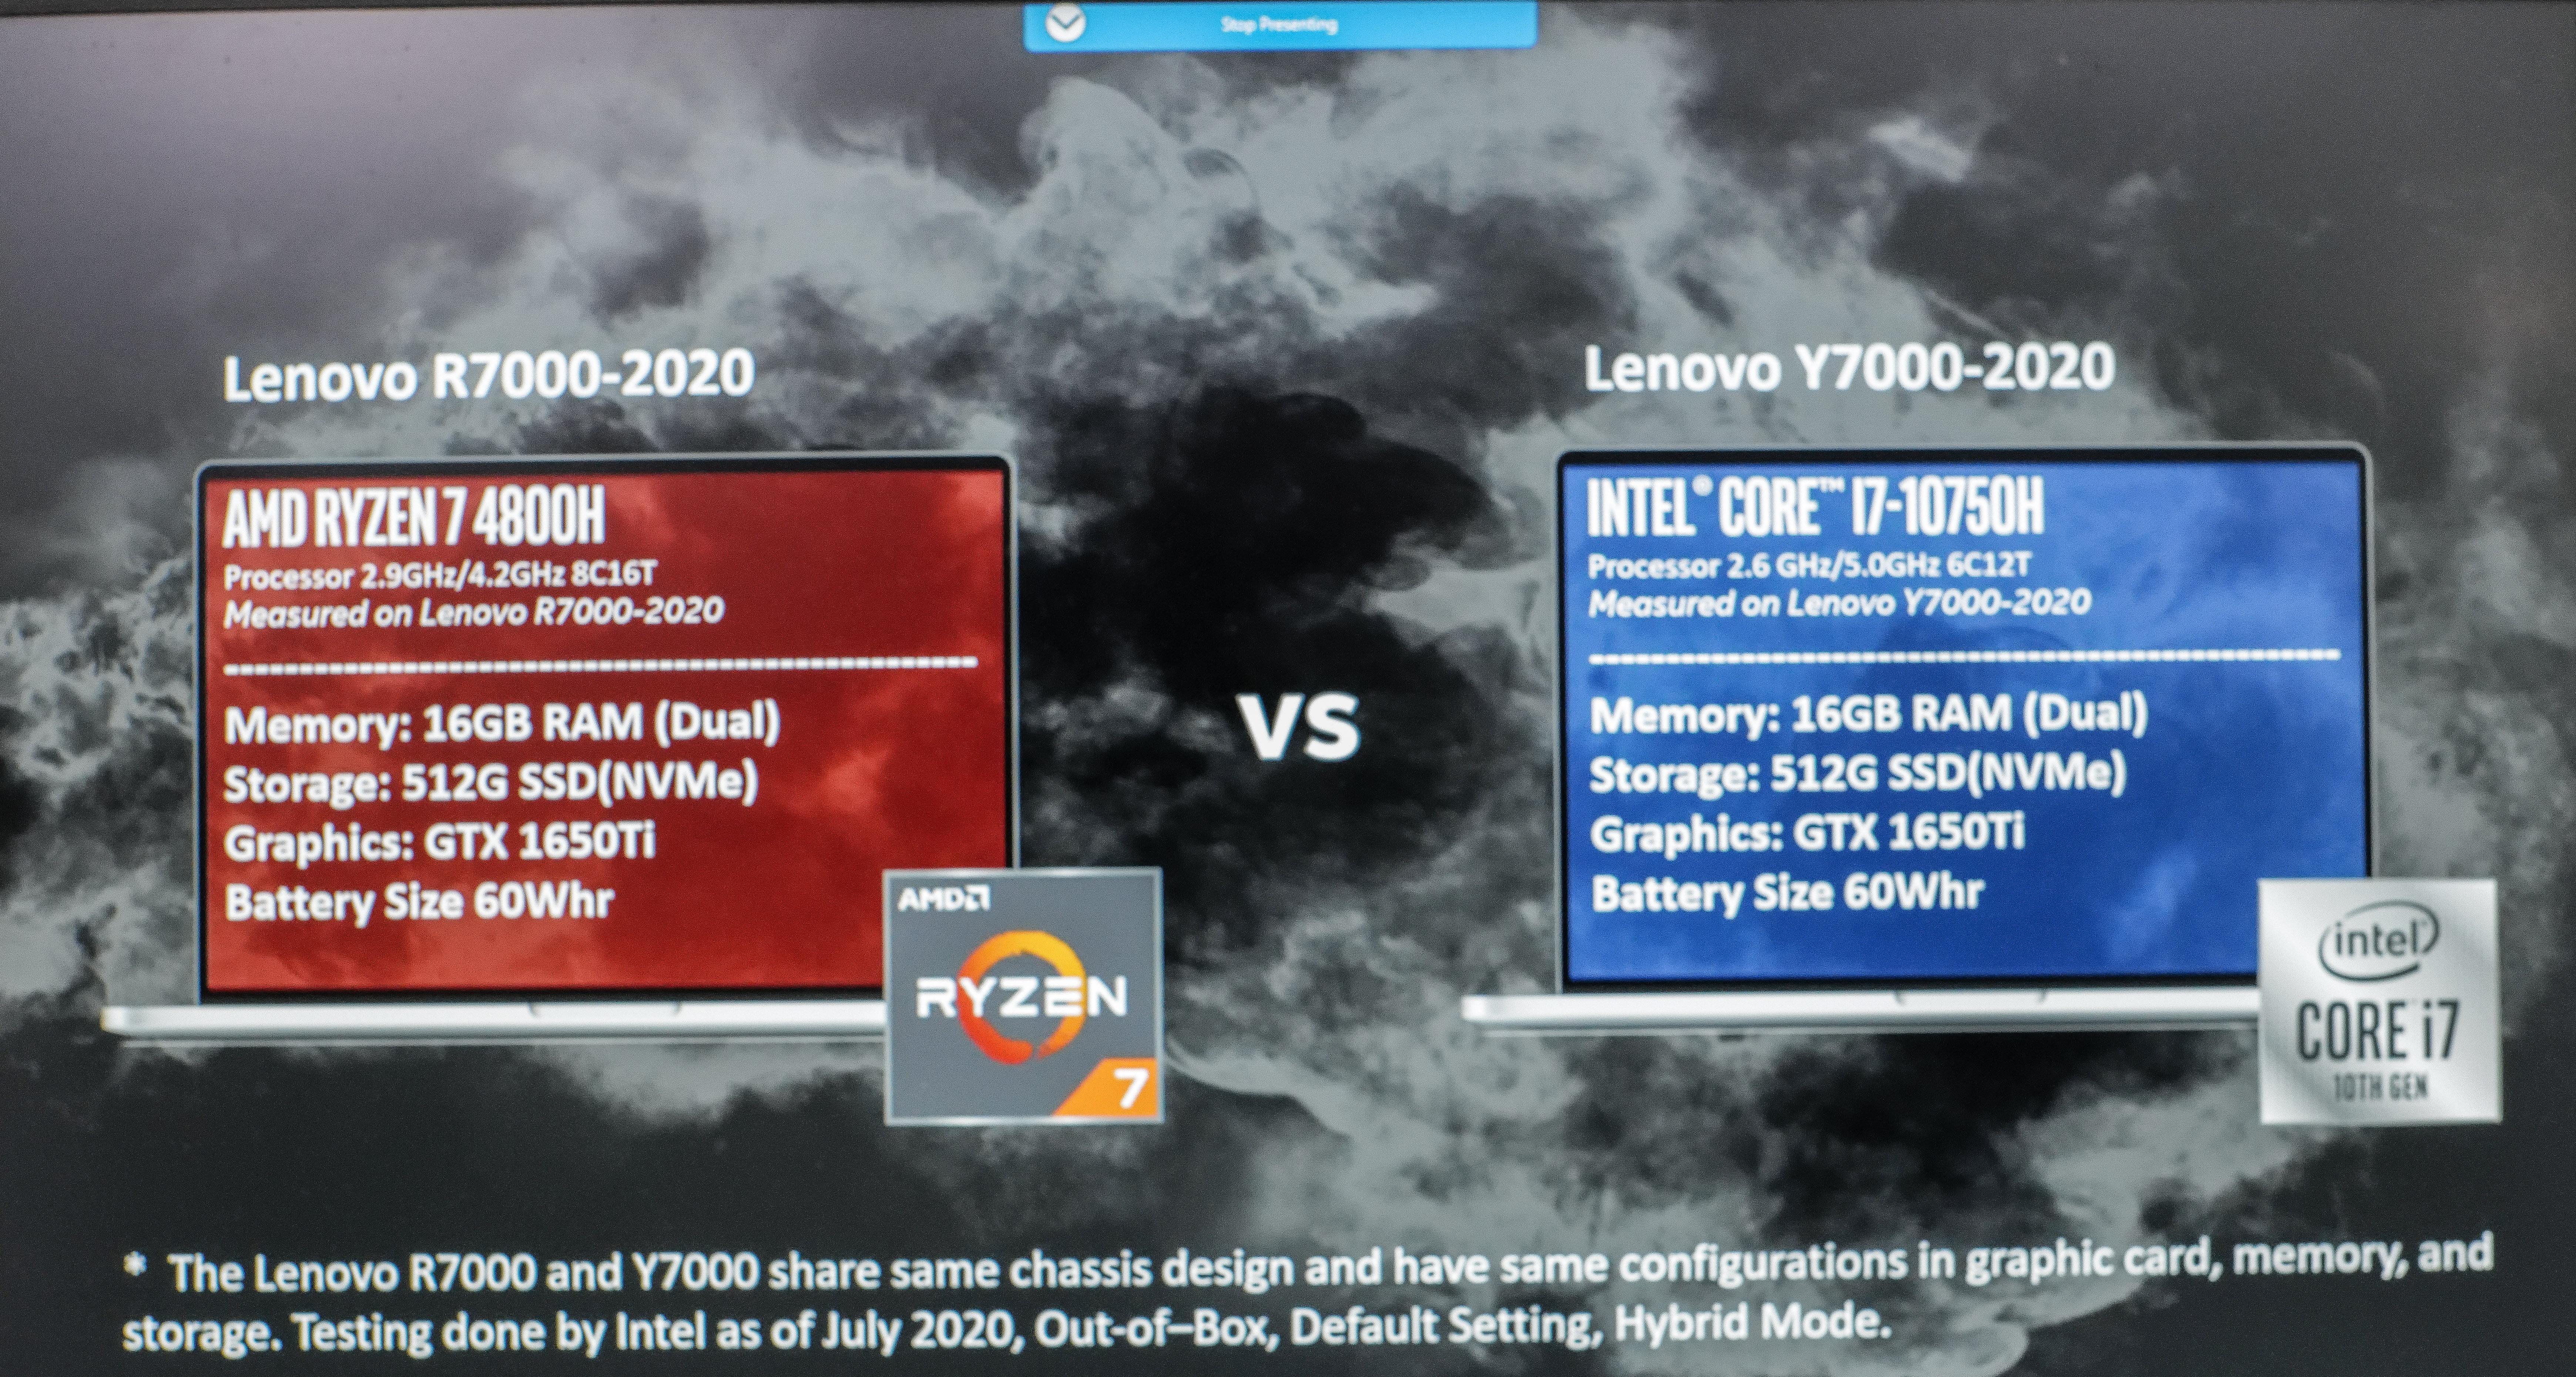 https://www.coolaler.com.tw/coolalercbb/Intel/2.jpg